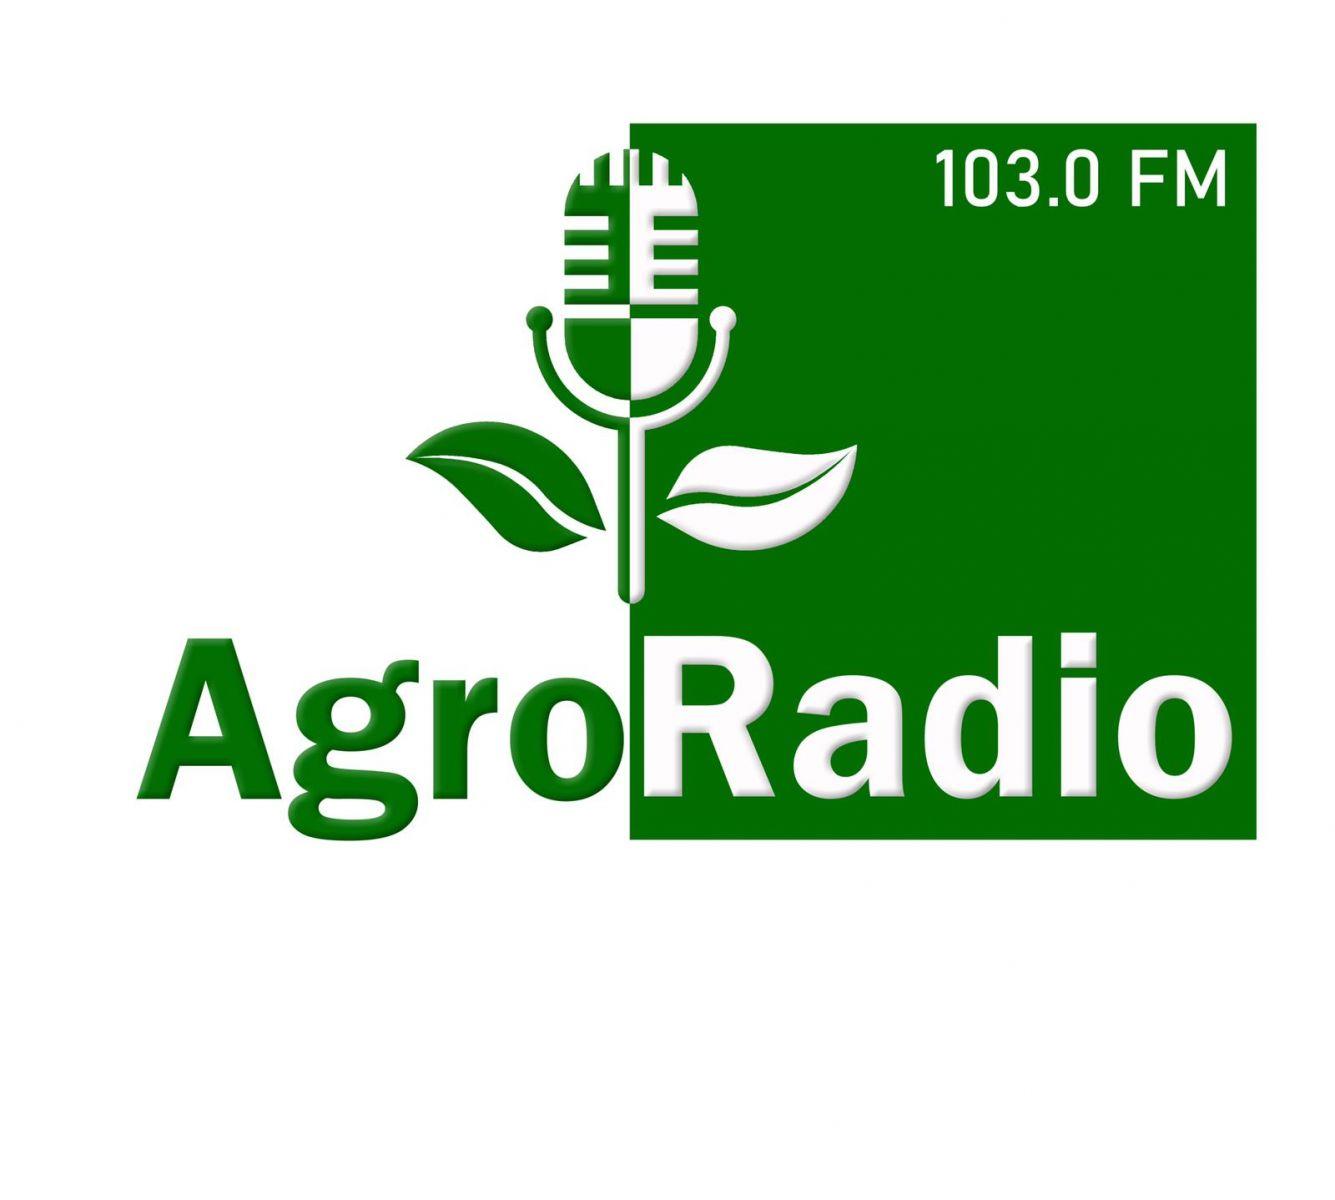 Agroradio